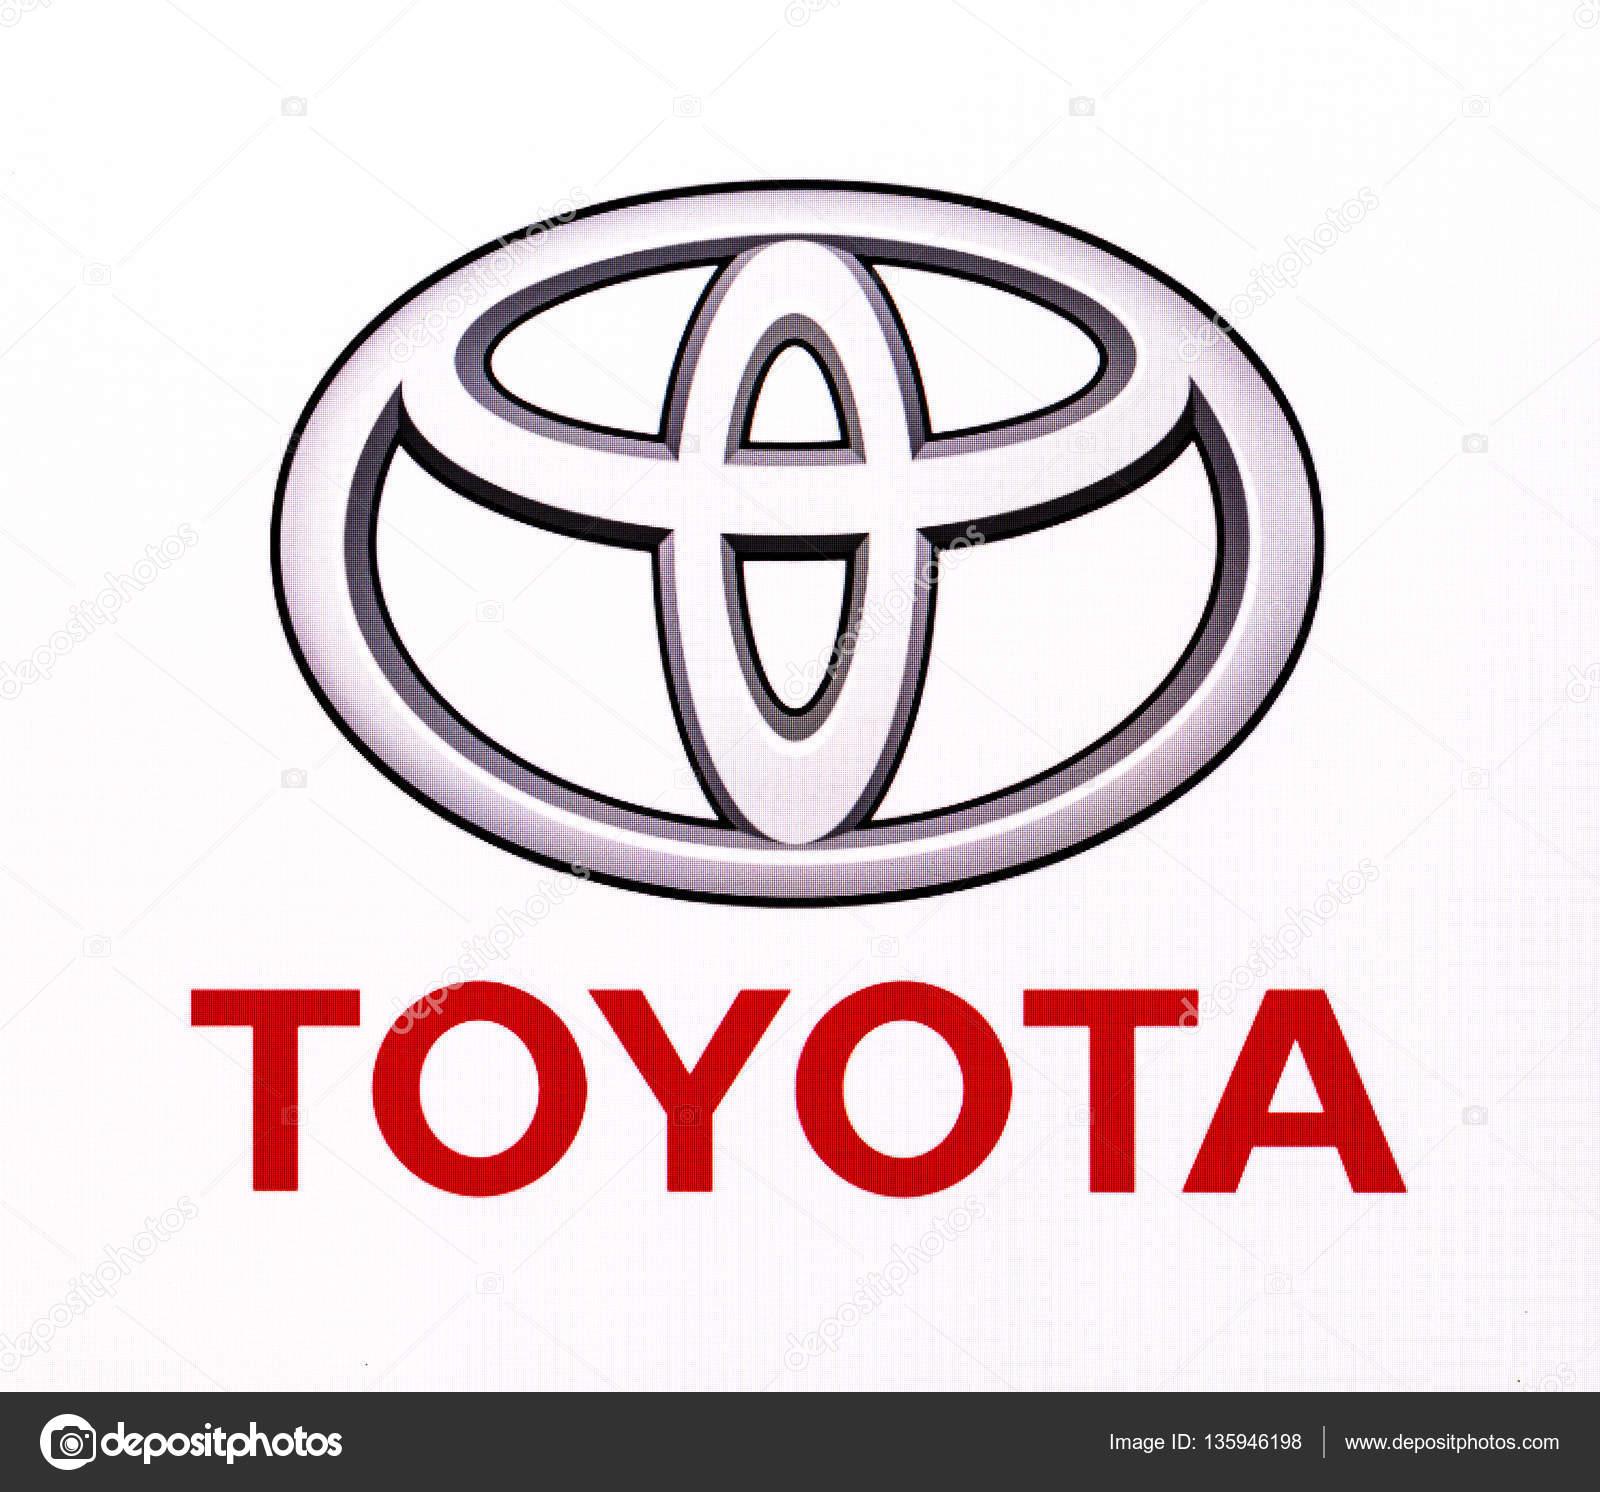 сколько лет Марке Toyota